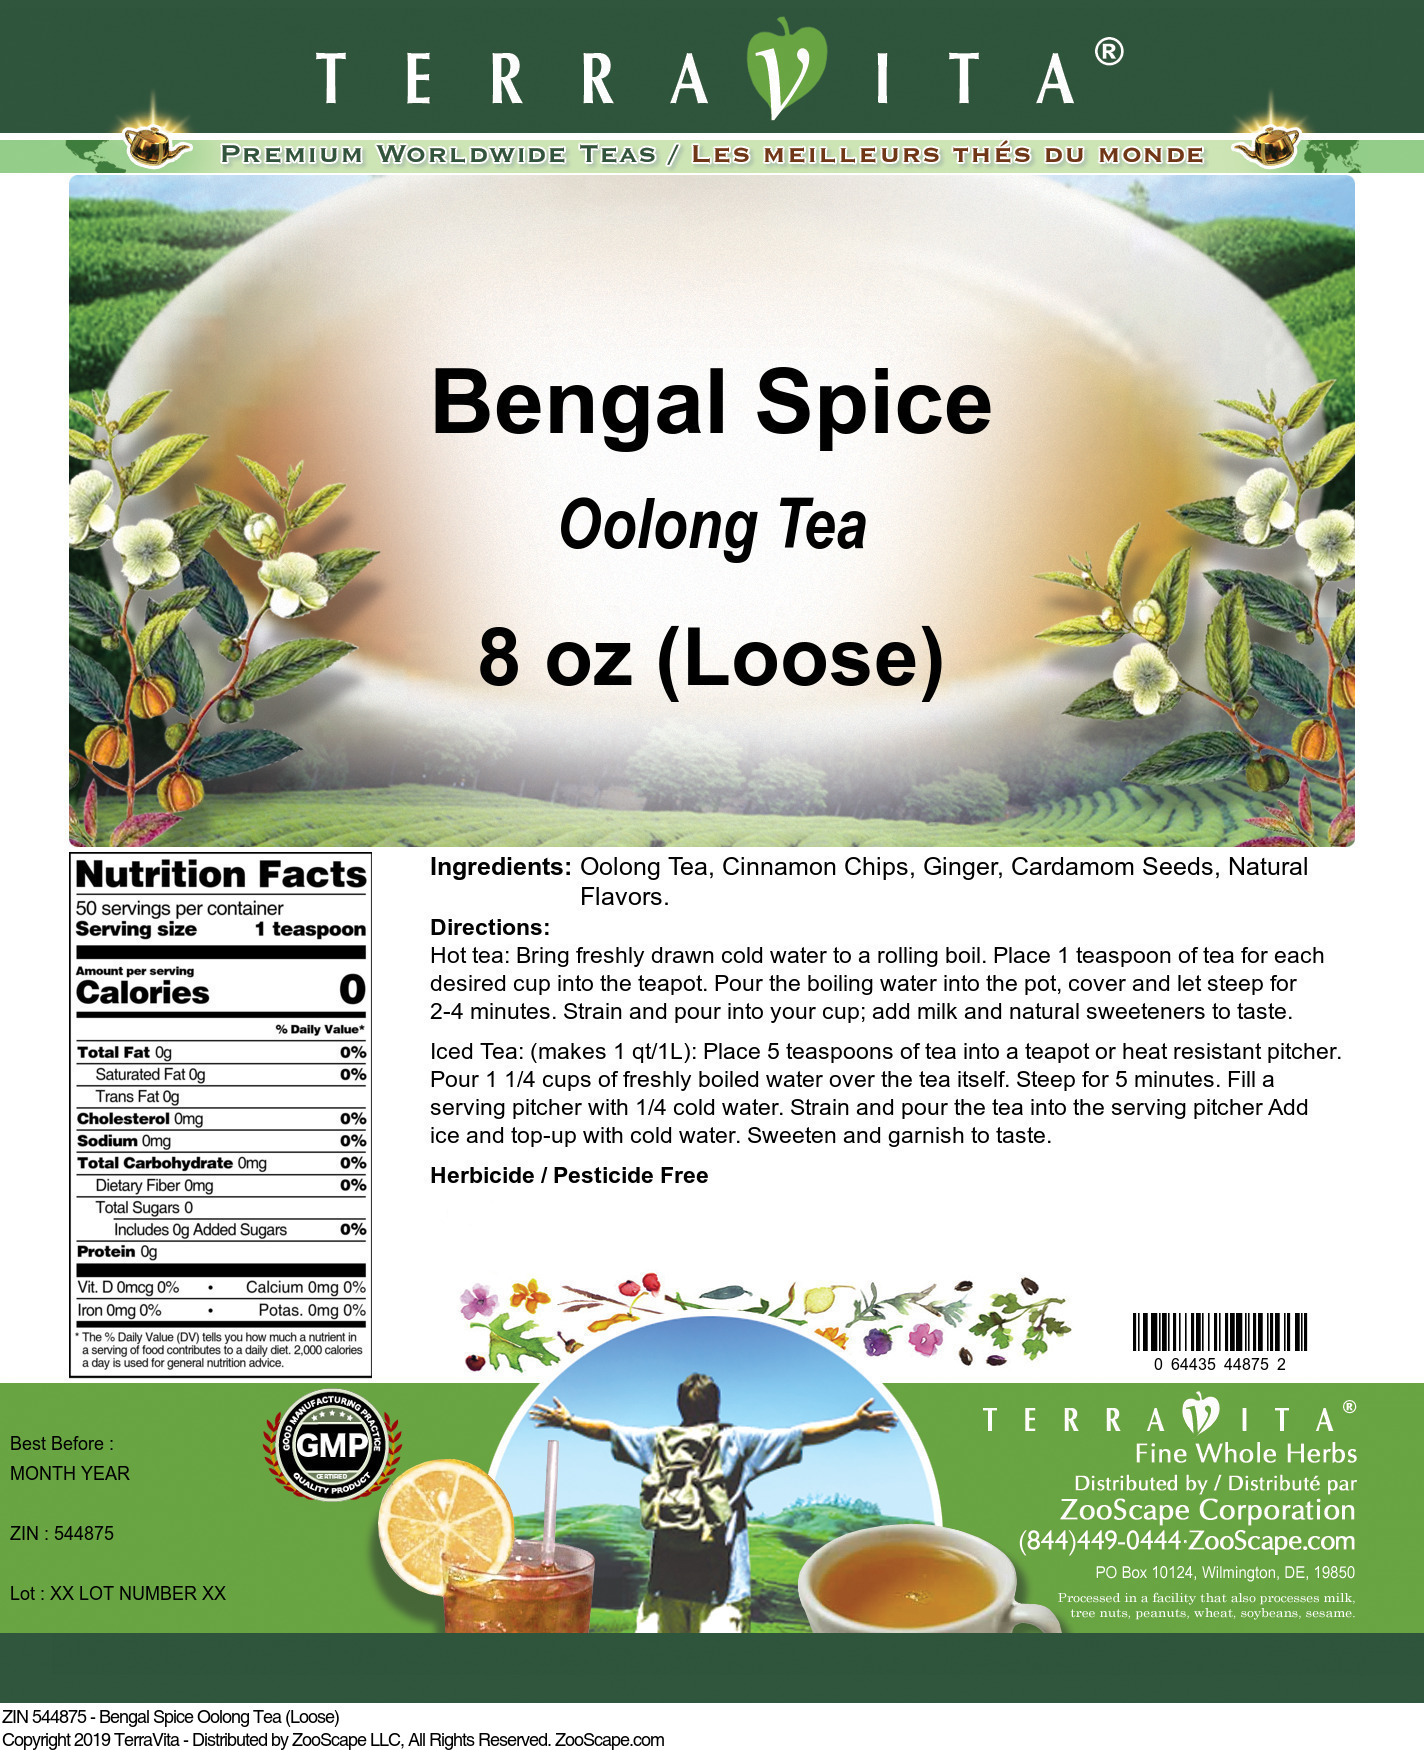 Bengal Spice Oolong Tea (Loose)